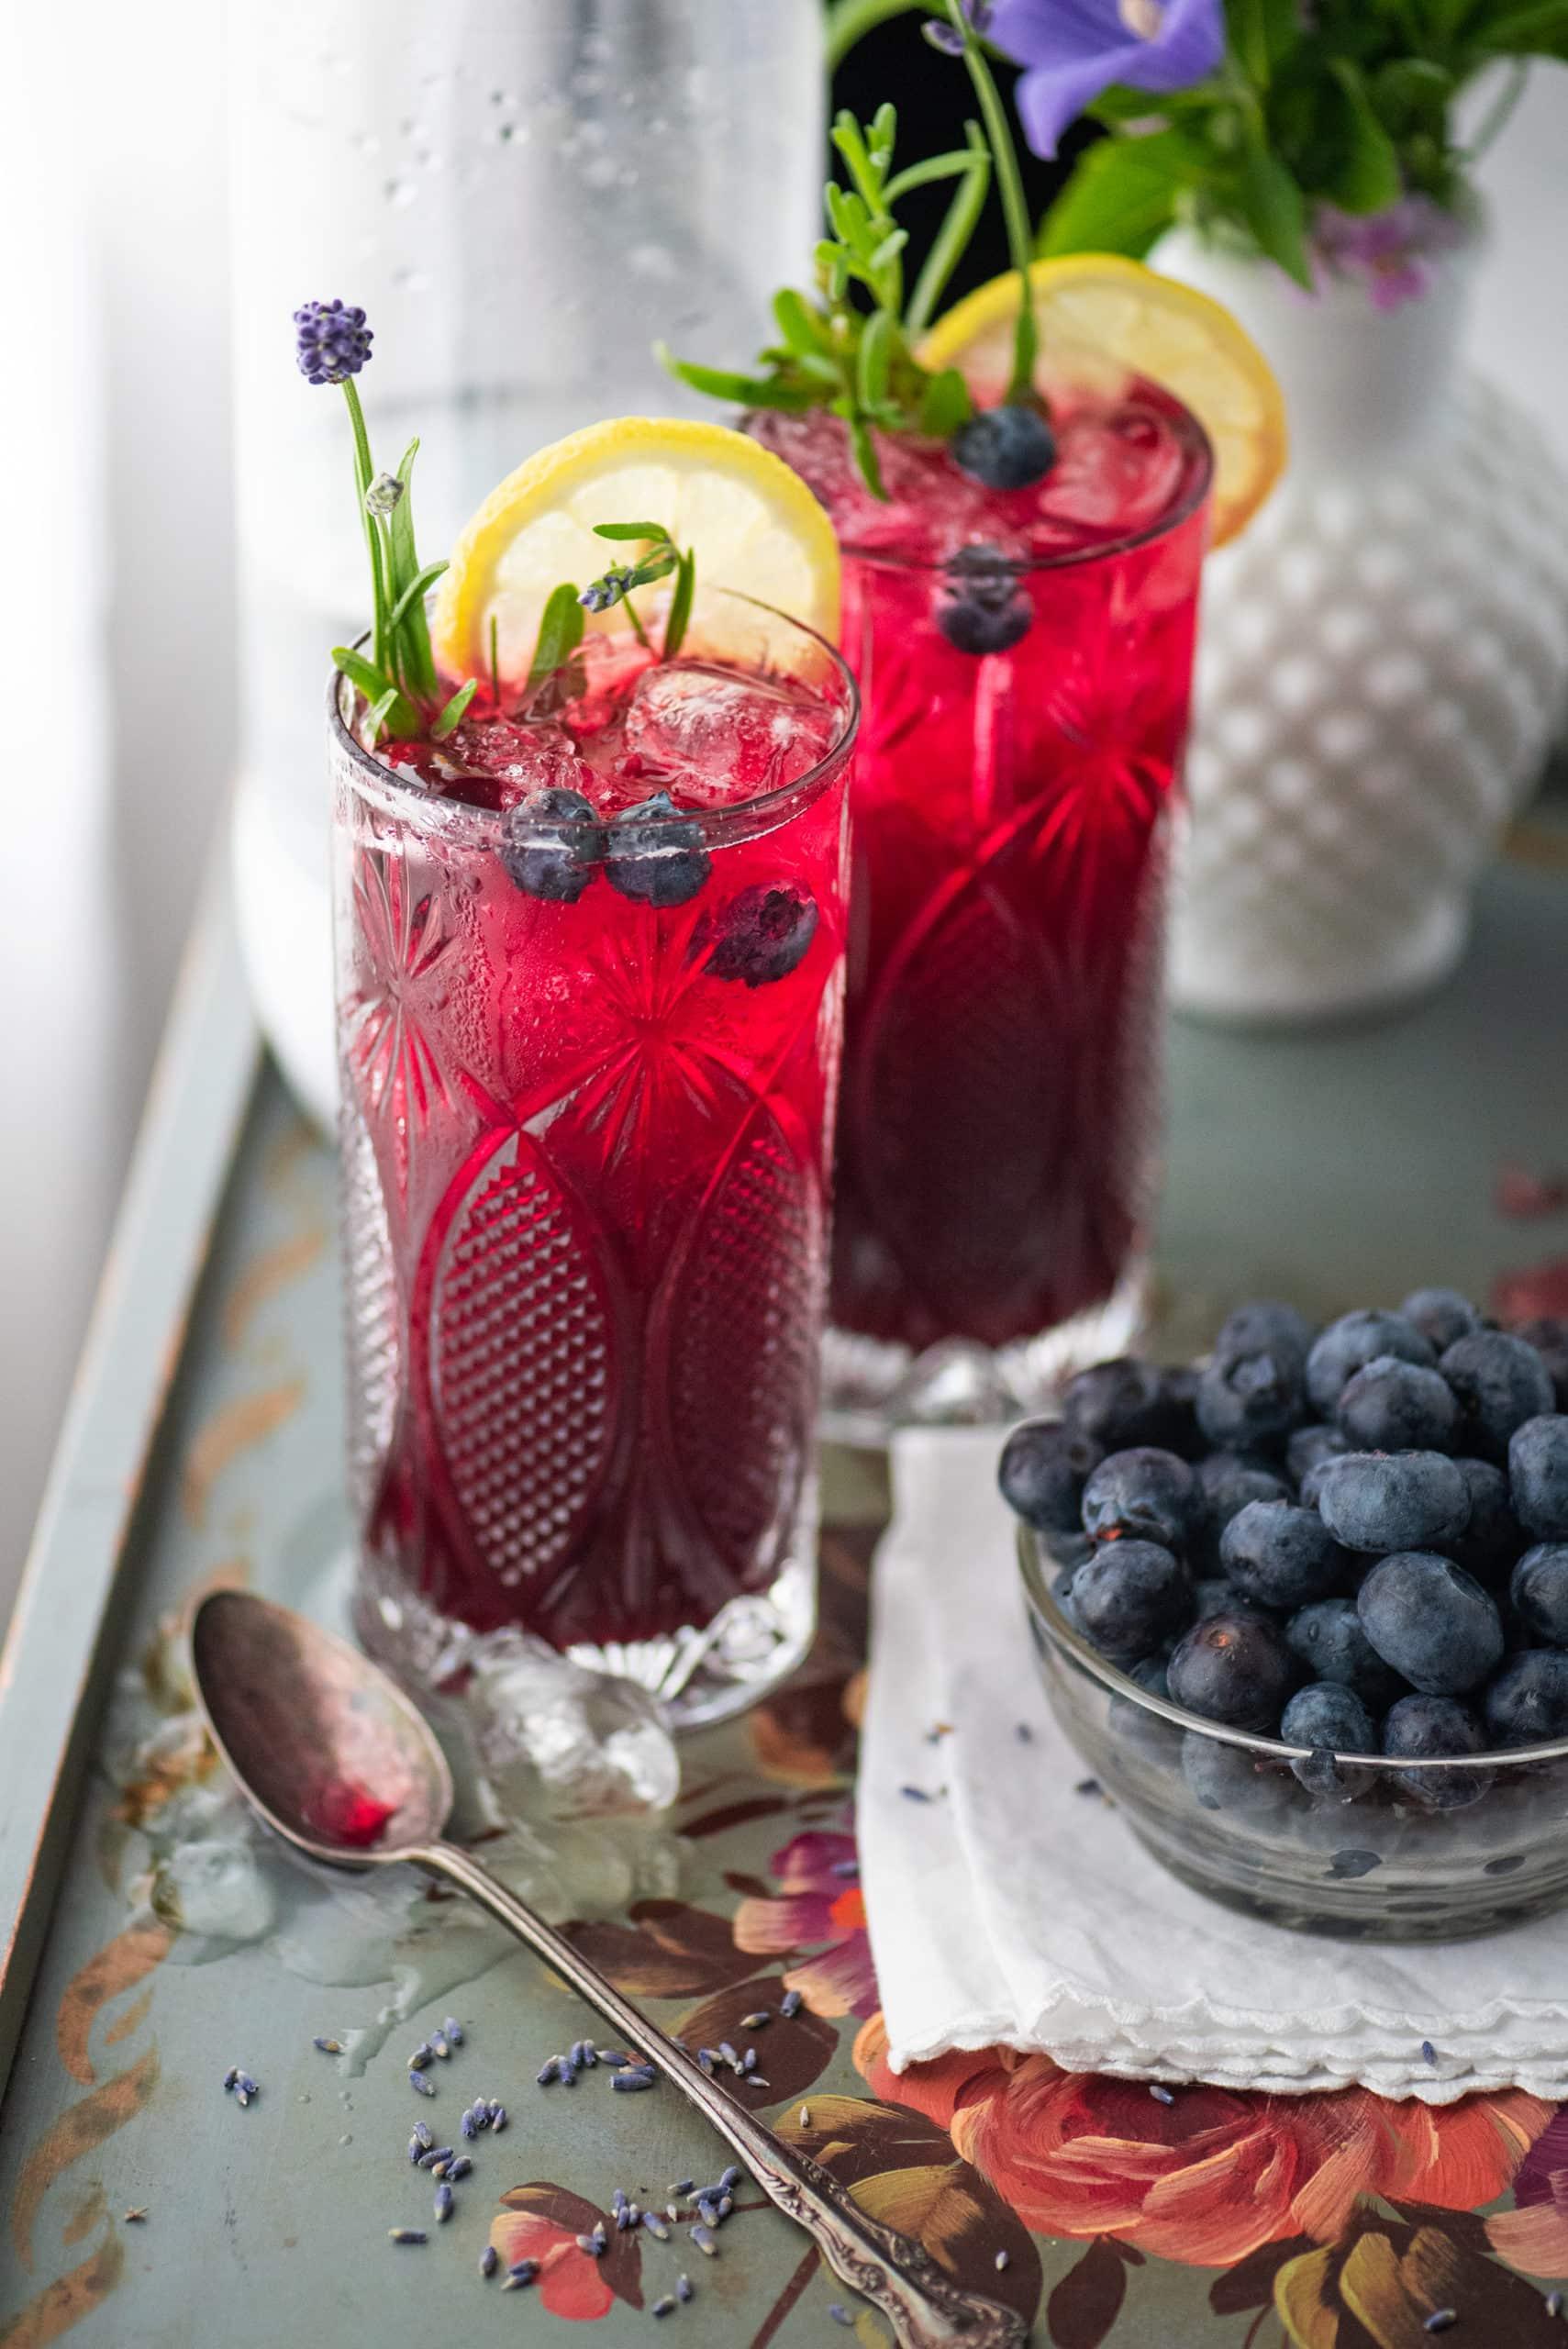 Blueberry Lavender Soda 7028 scaled - Blueberry Lavender Soda